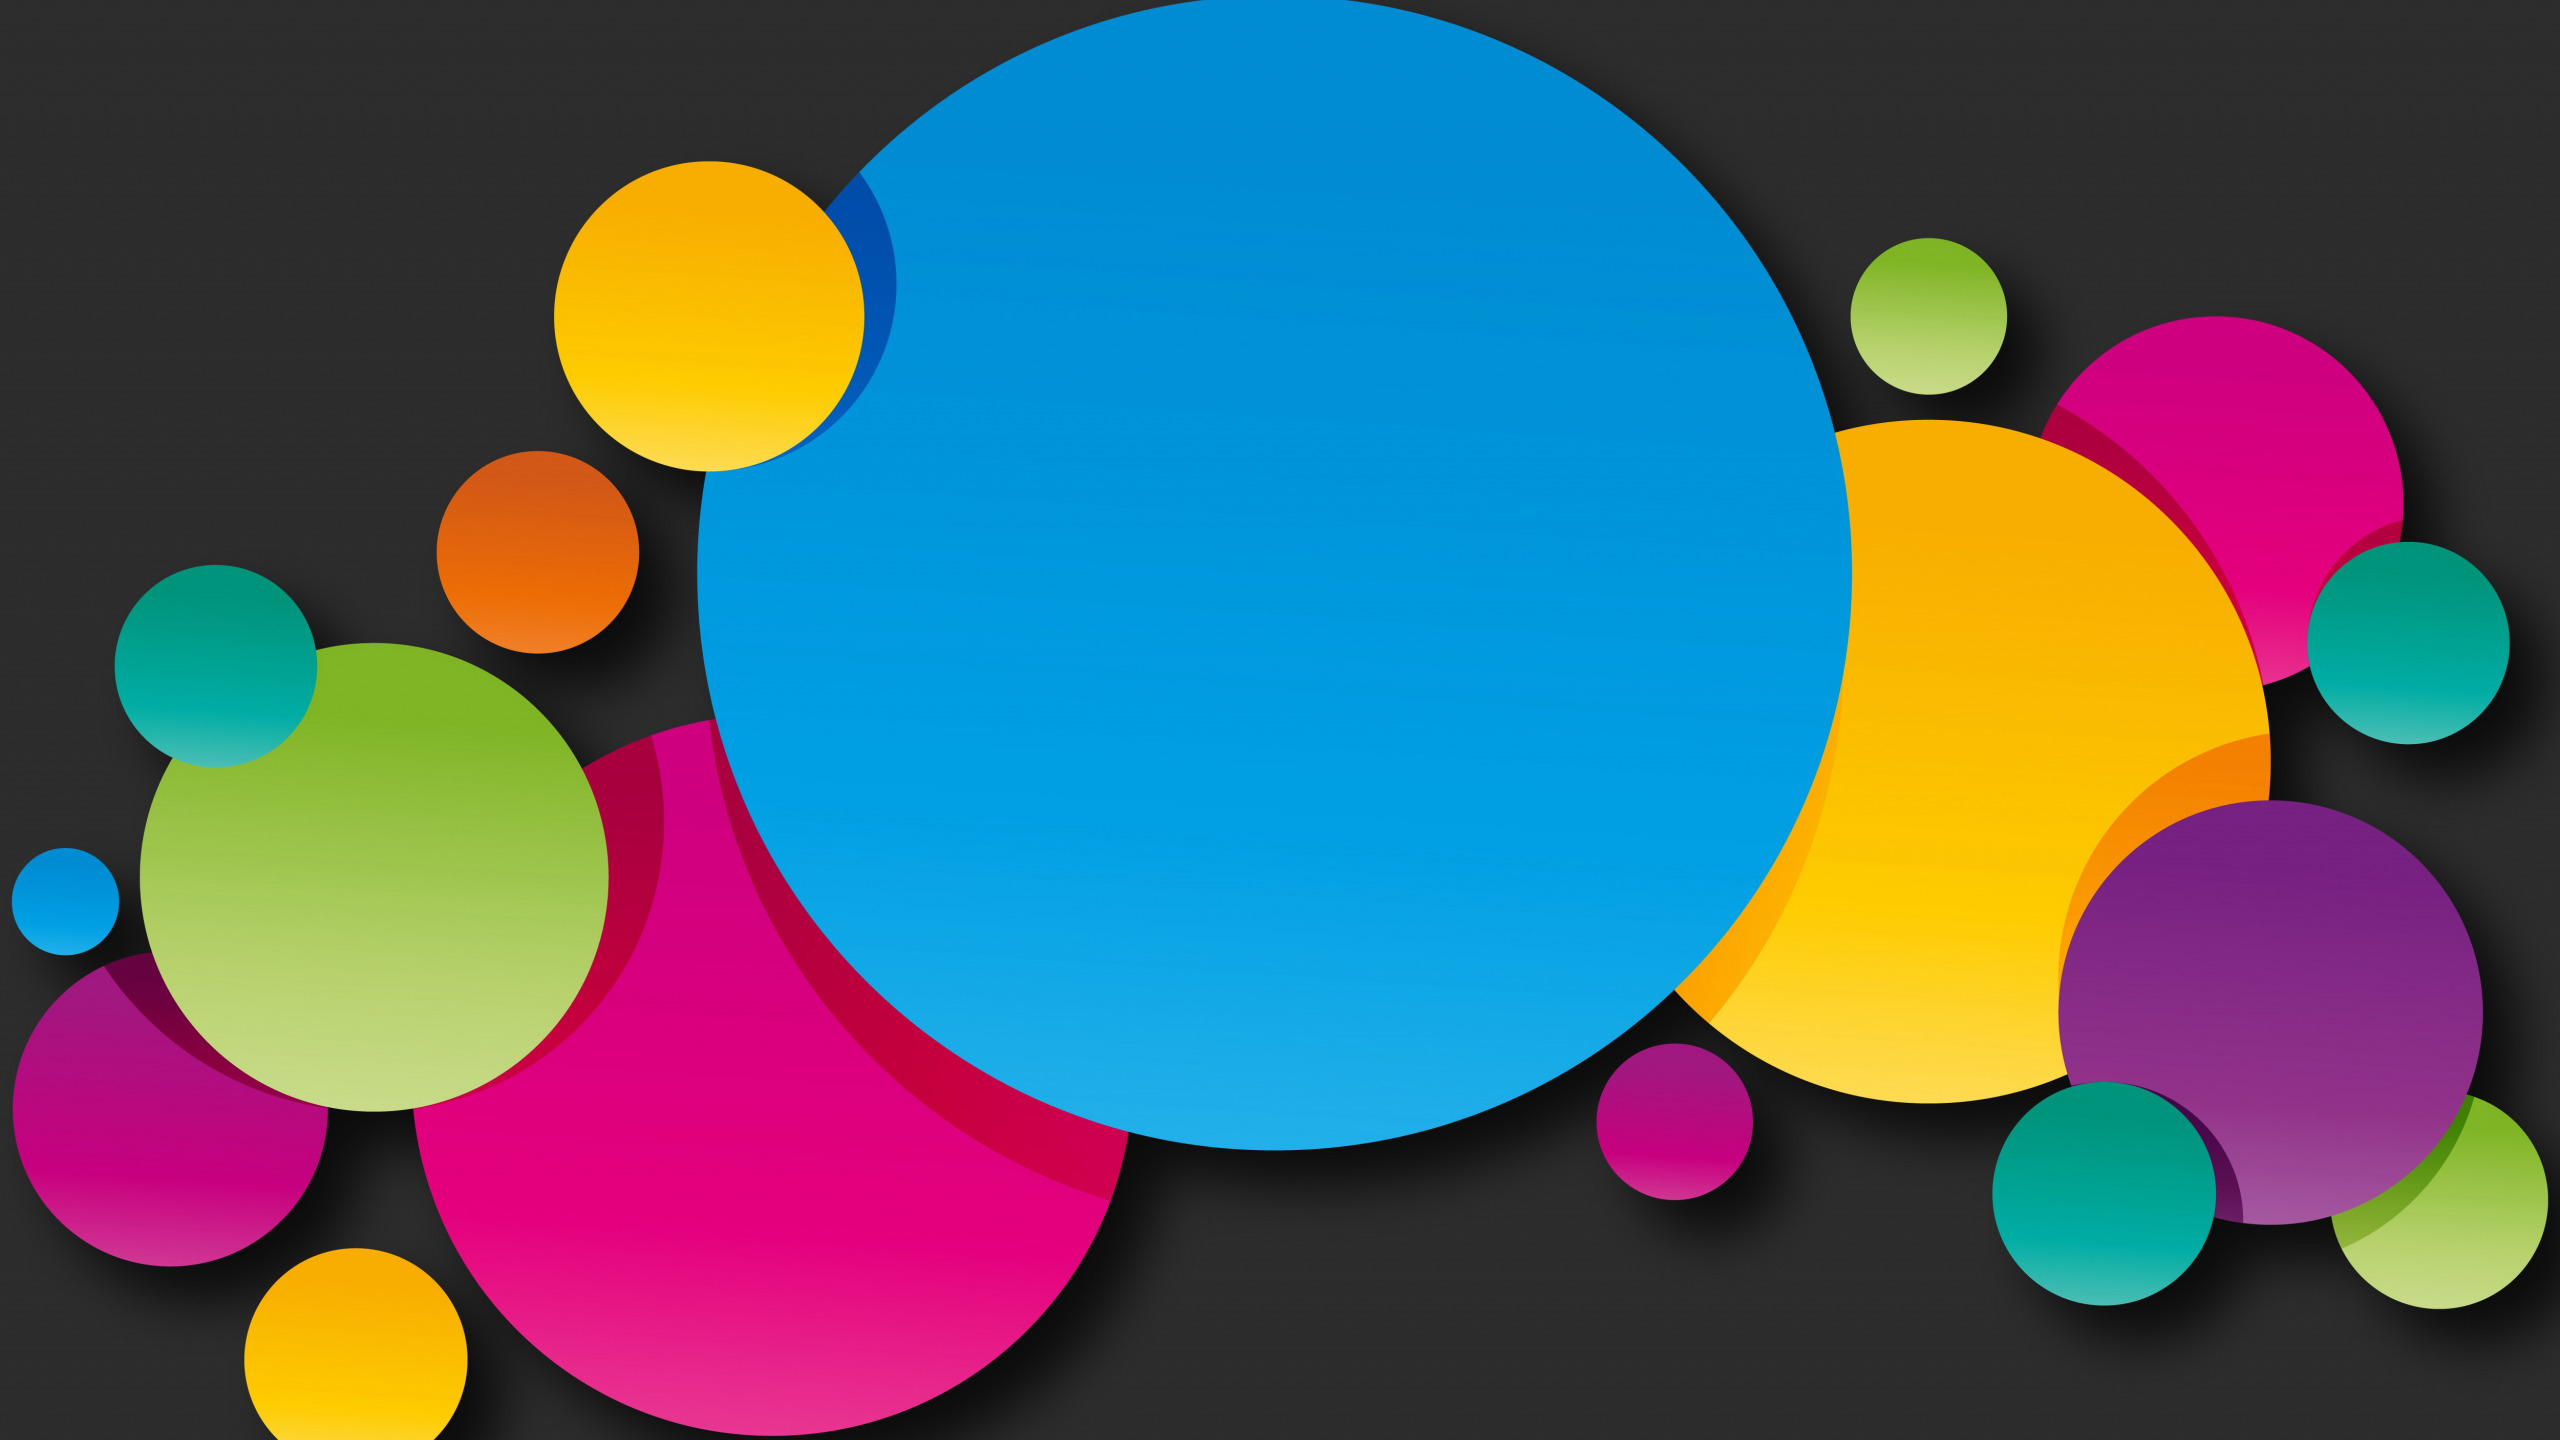 Обои colorful, background, geometry, colors, Abstract, shapes, rainbow. Абстракции foto 16